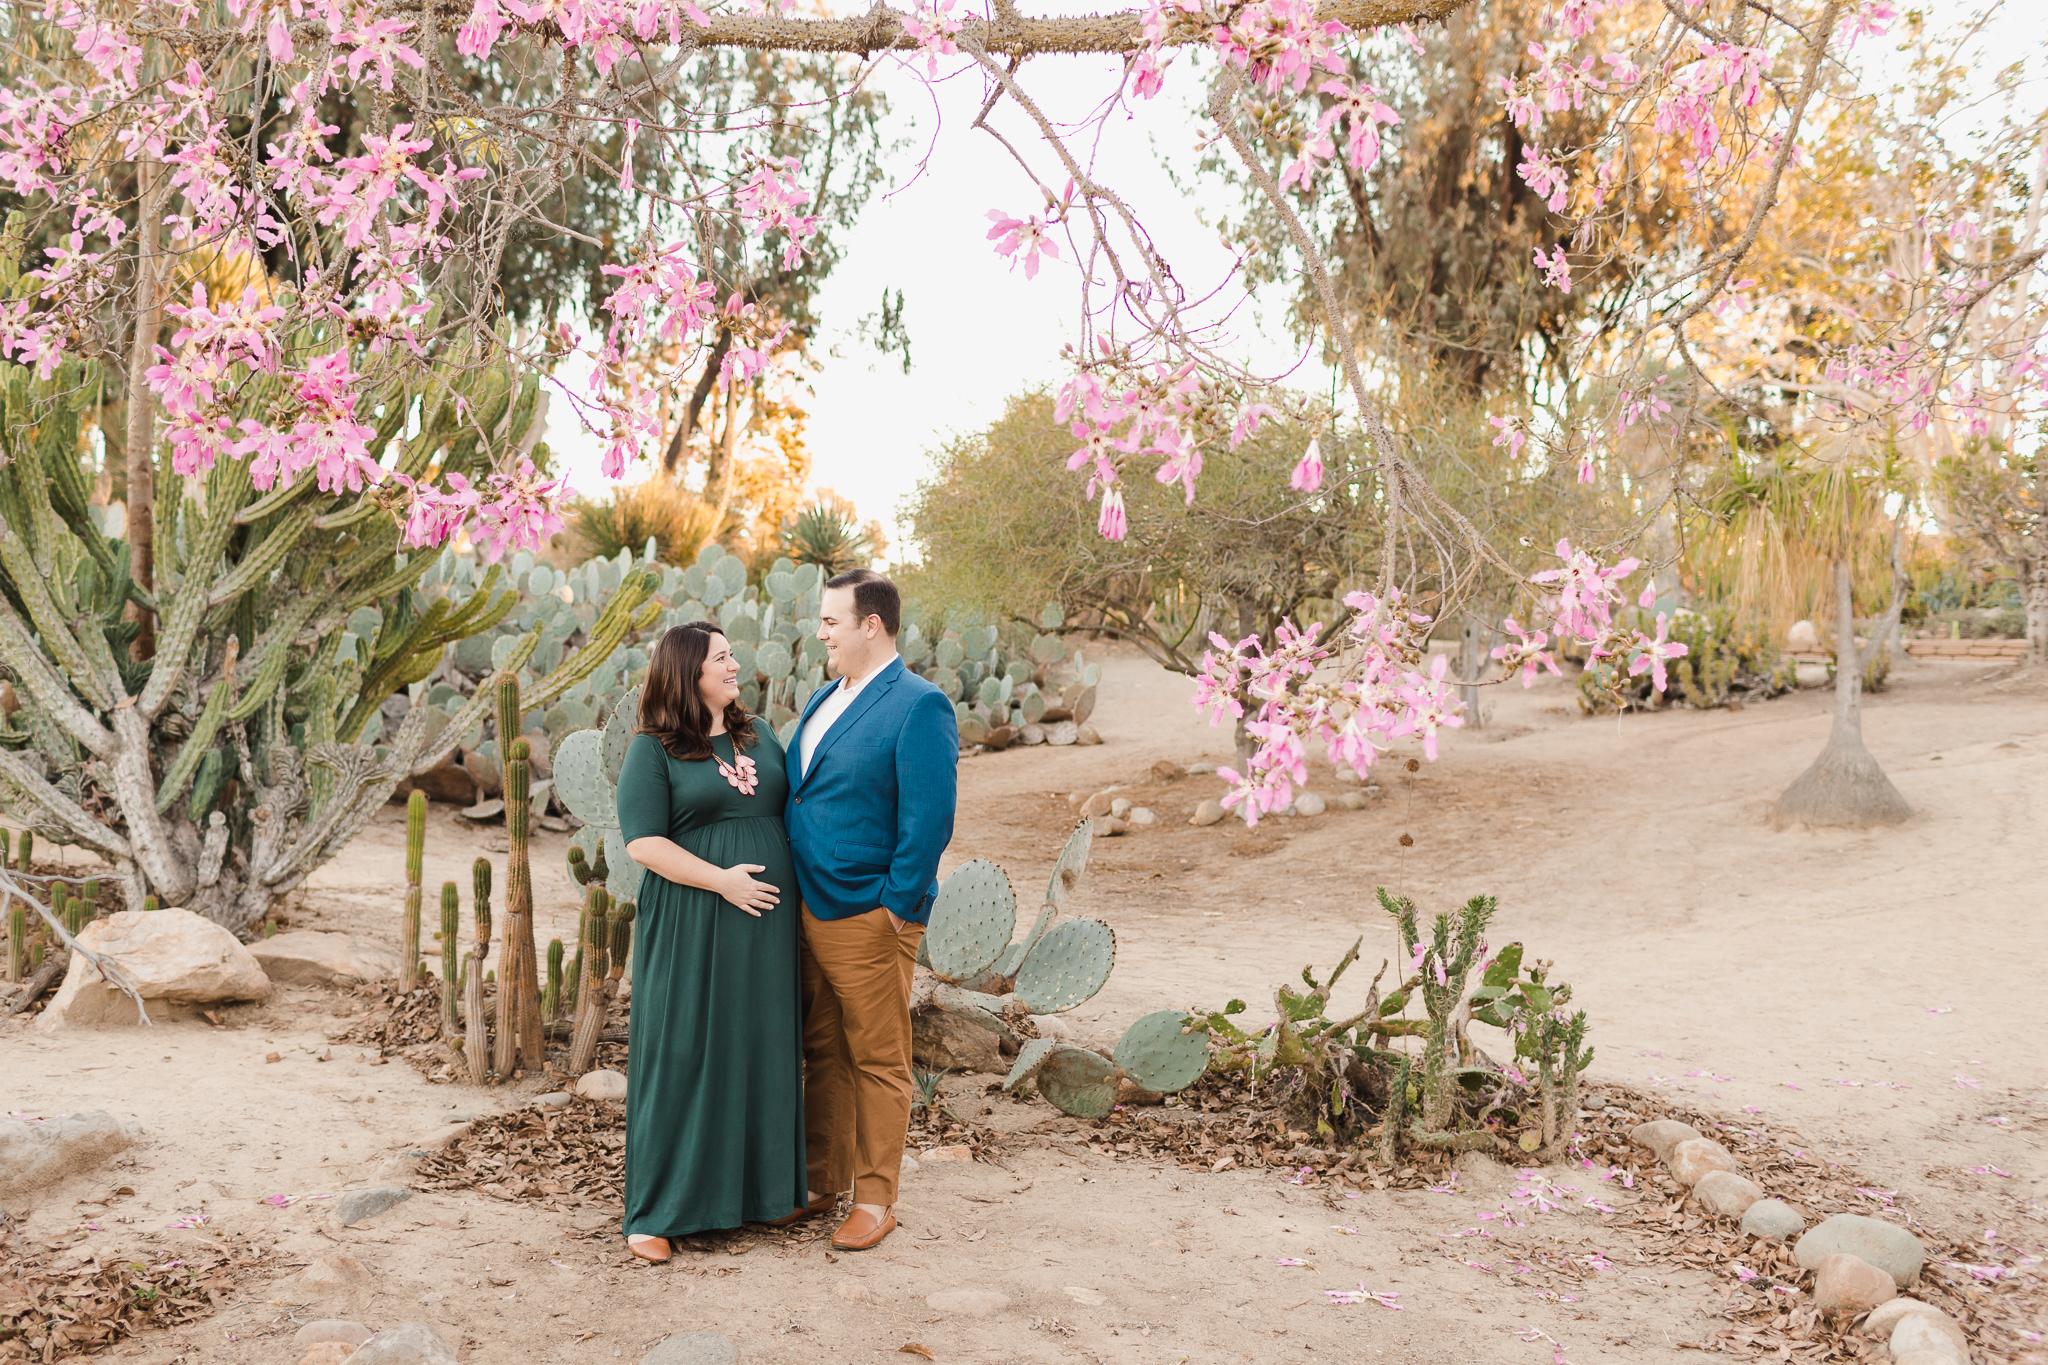 San-Diego-Maternity-and-Newborn-Photographer-Balboa-Park-1.jpg